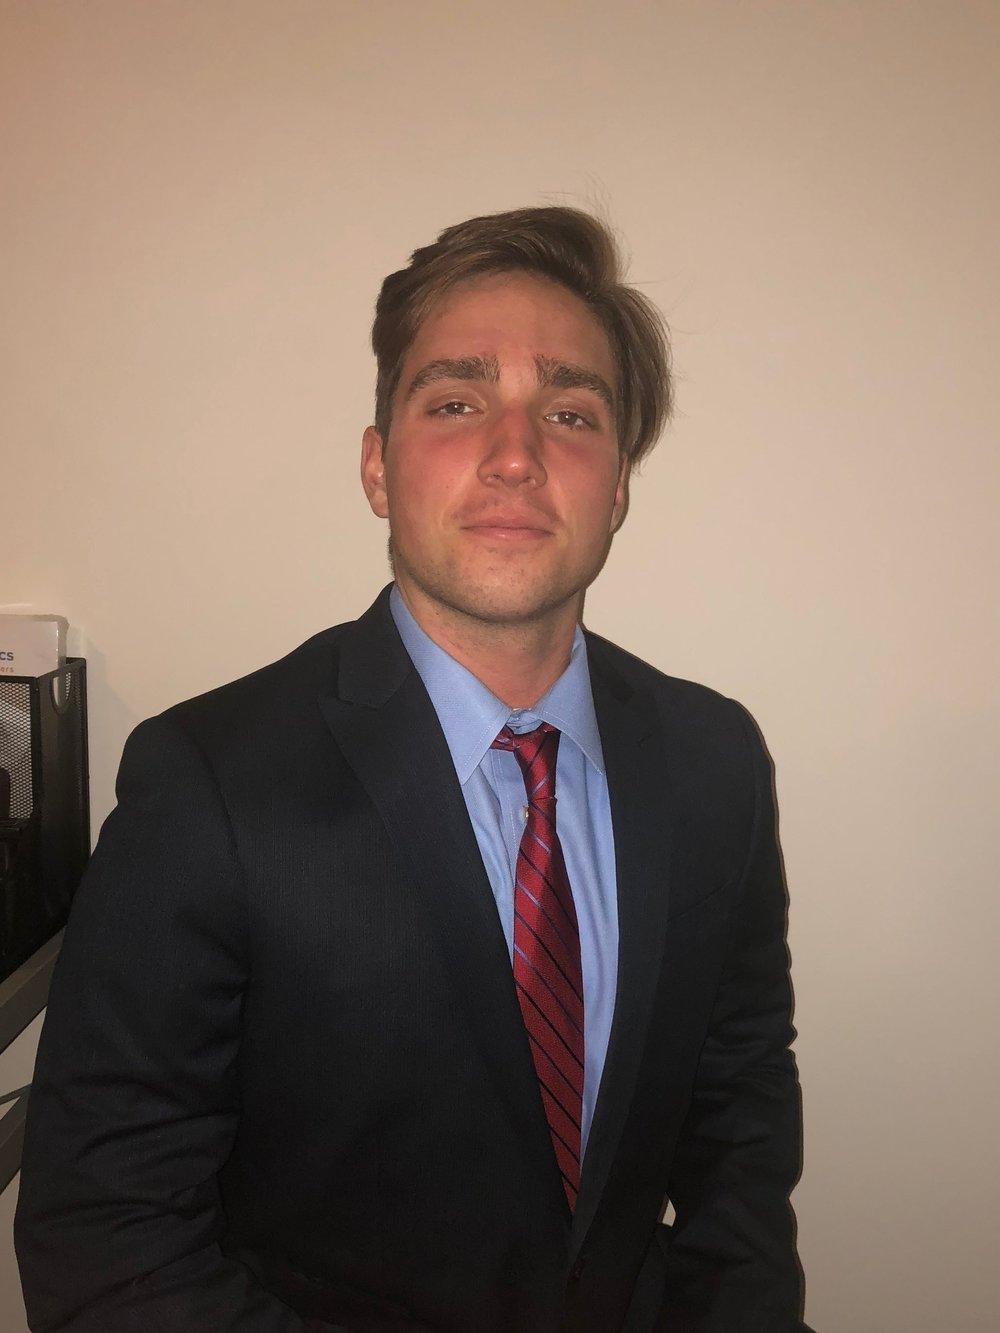 VP of External Affairs - Kyle HauptmanClass of 2021Major: Finance & MarketingHometown: Smithtown, NY